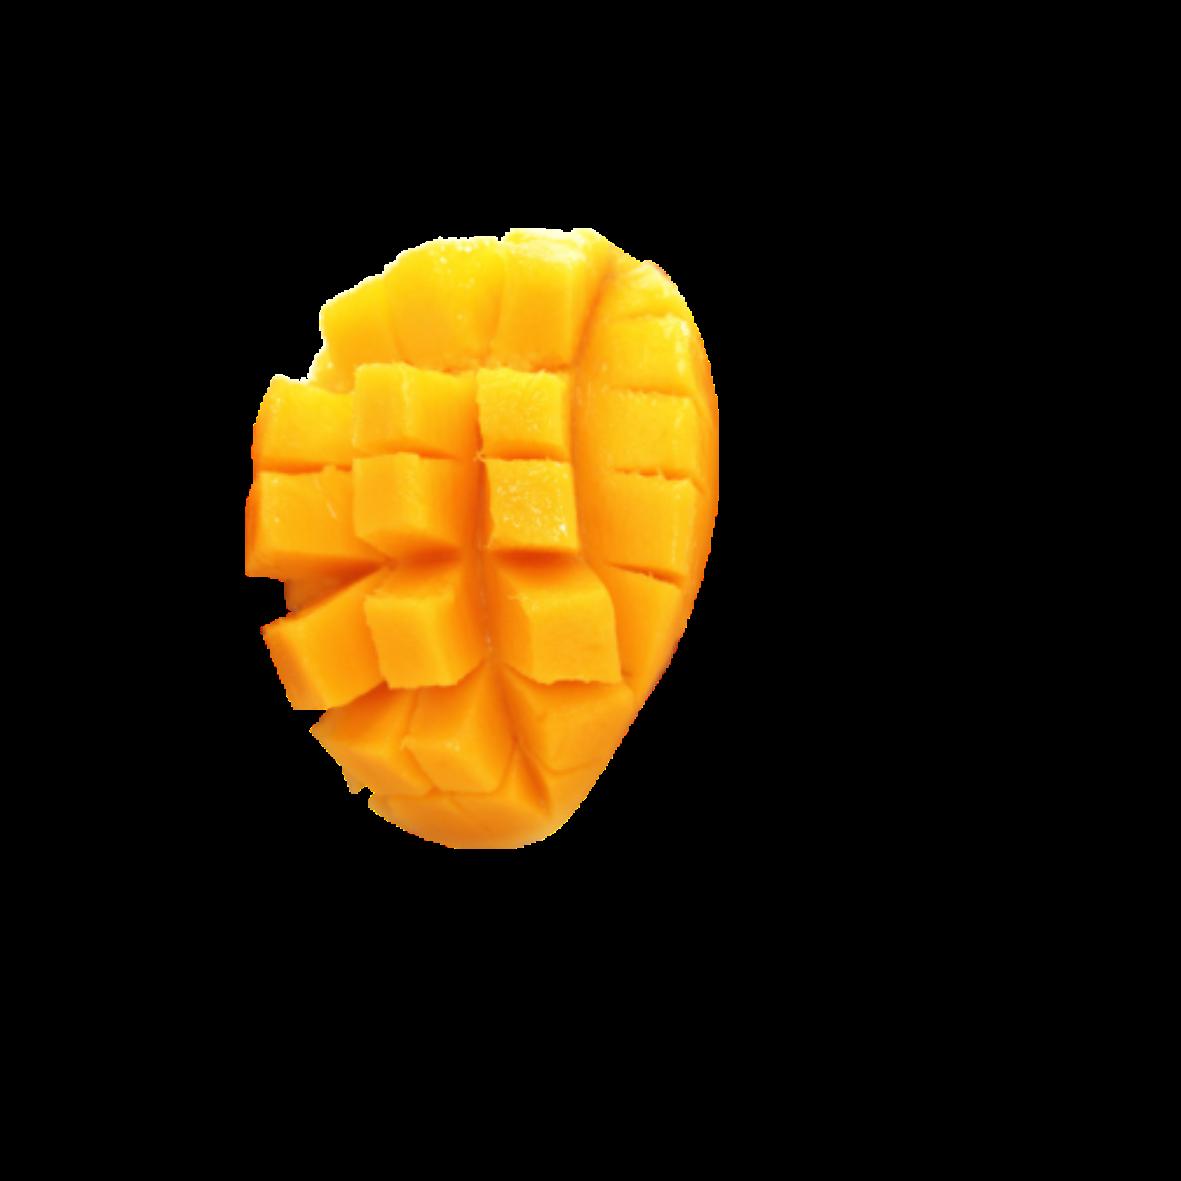 Mango clipart cut png. My webpage